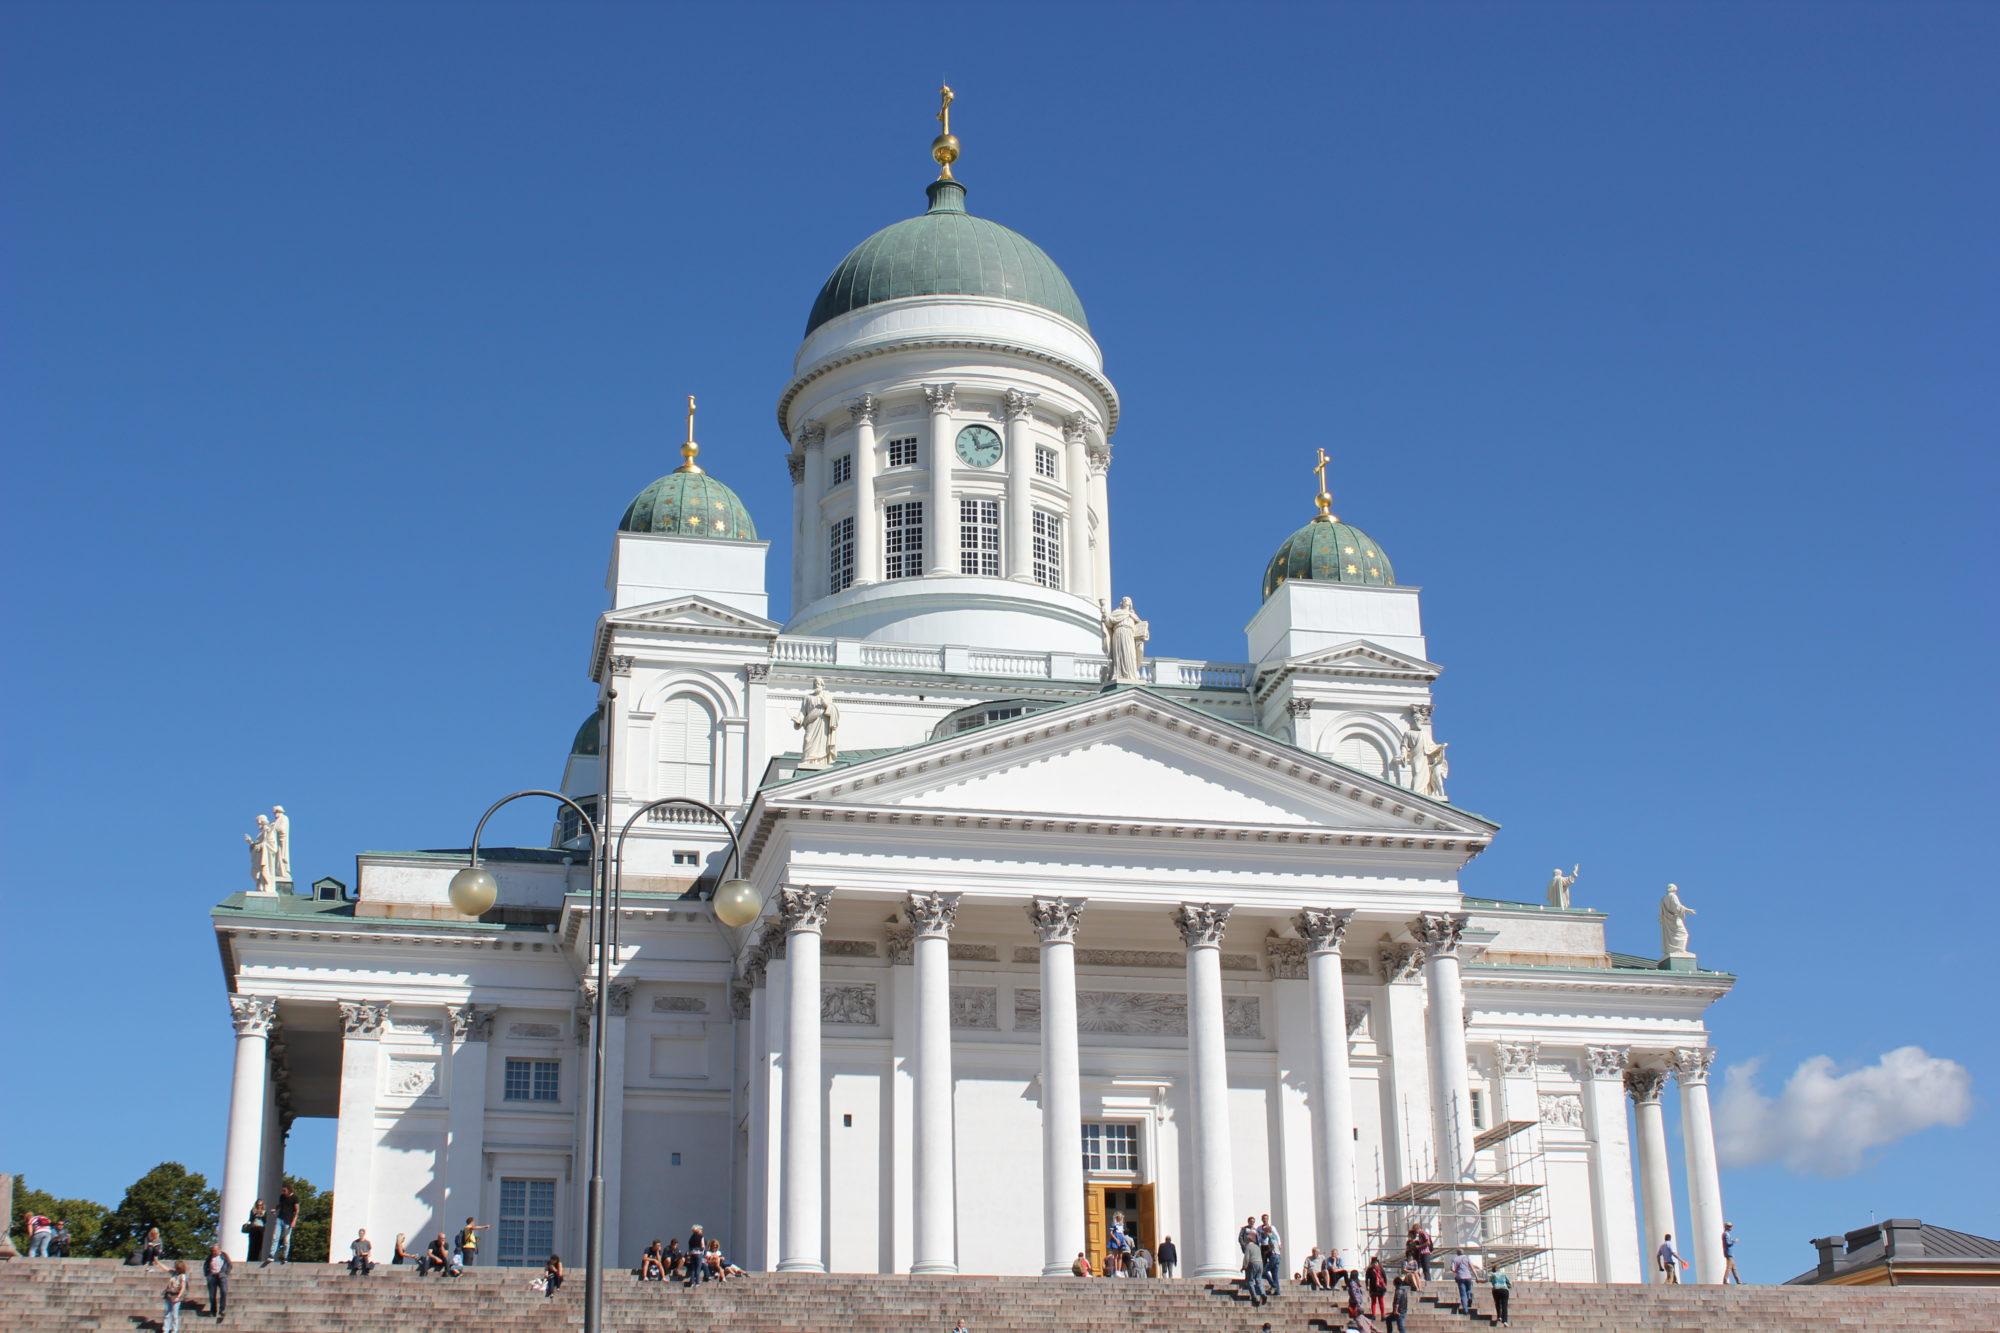 Helsinki - ikuisesti #lilous @KPohjanvirta #visithelsinki